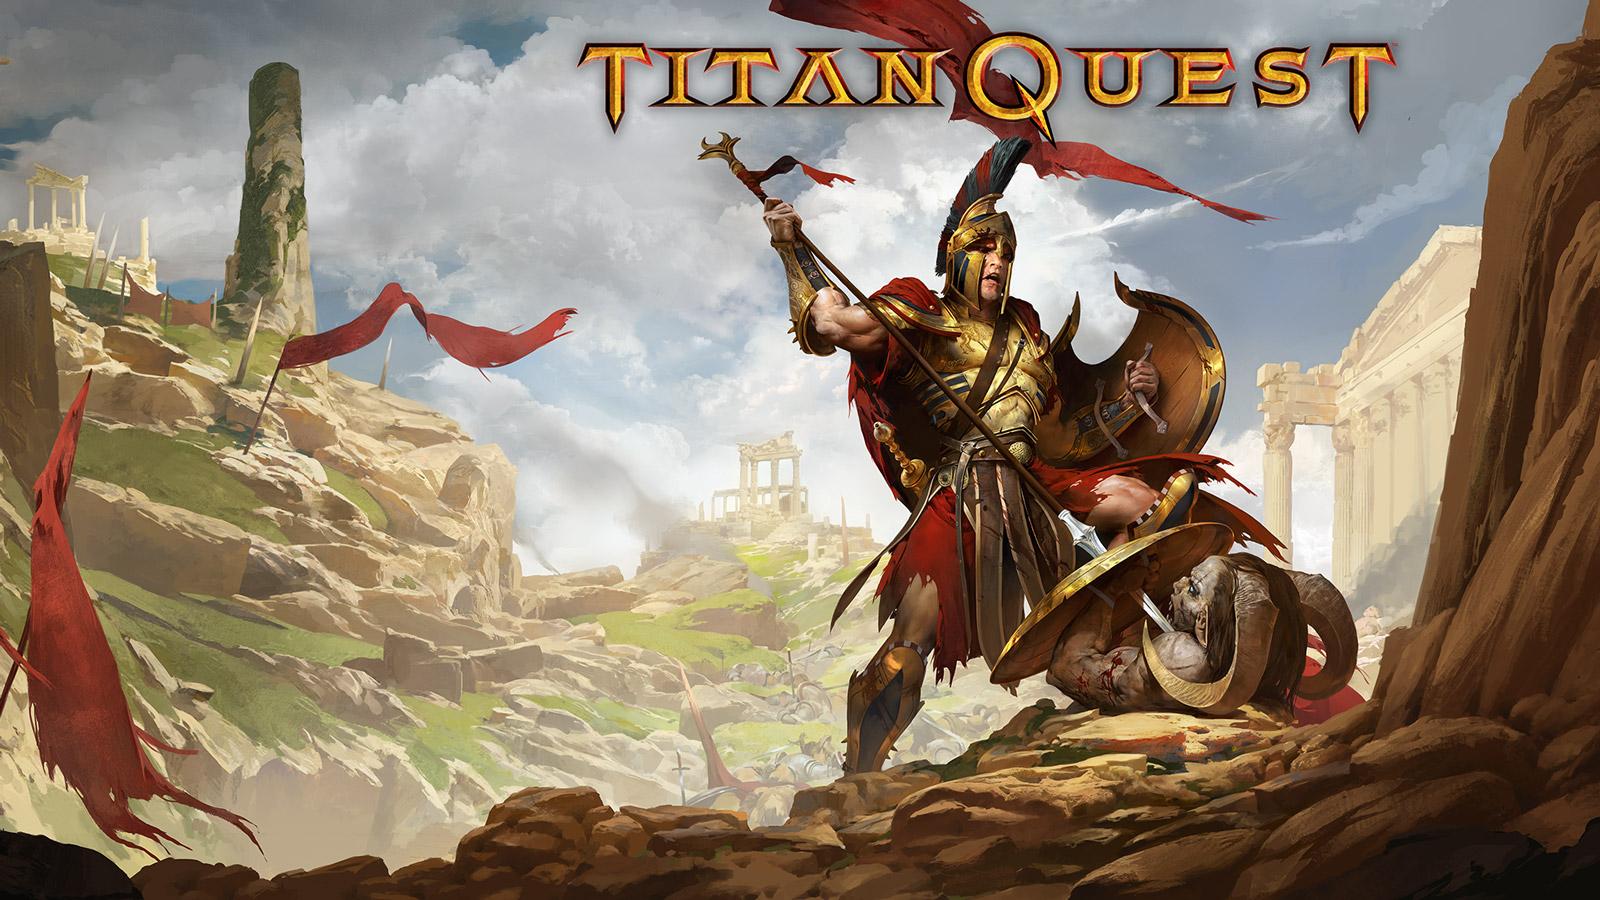 Titan Quest Wallpaper in 1600x900